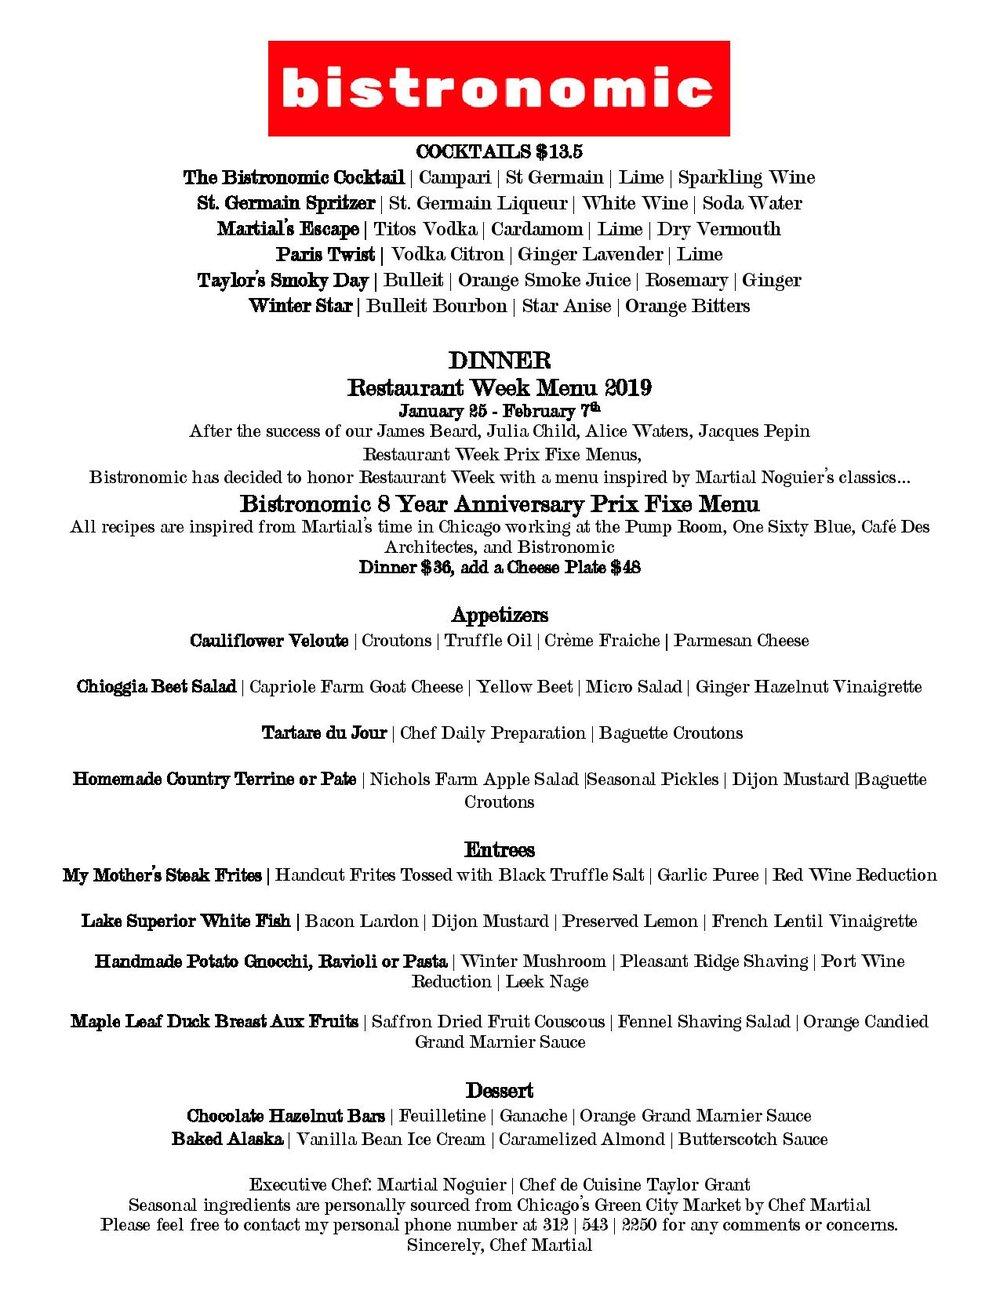 Bistronomic Dinner Menu-page-001.jpg